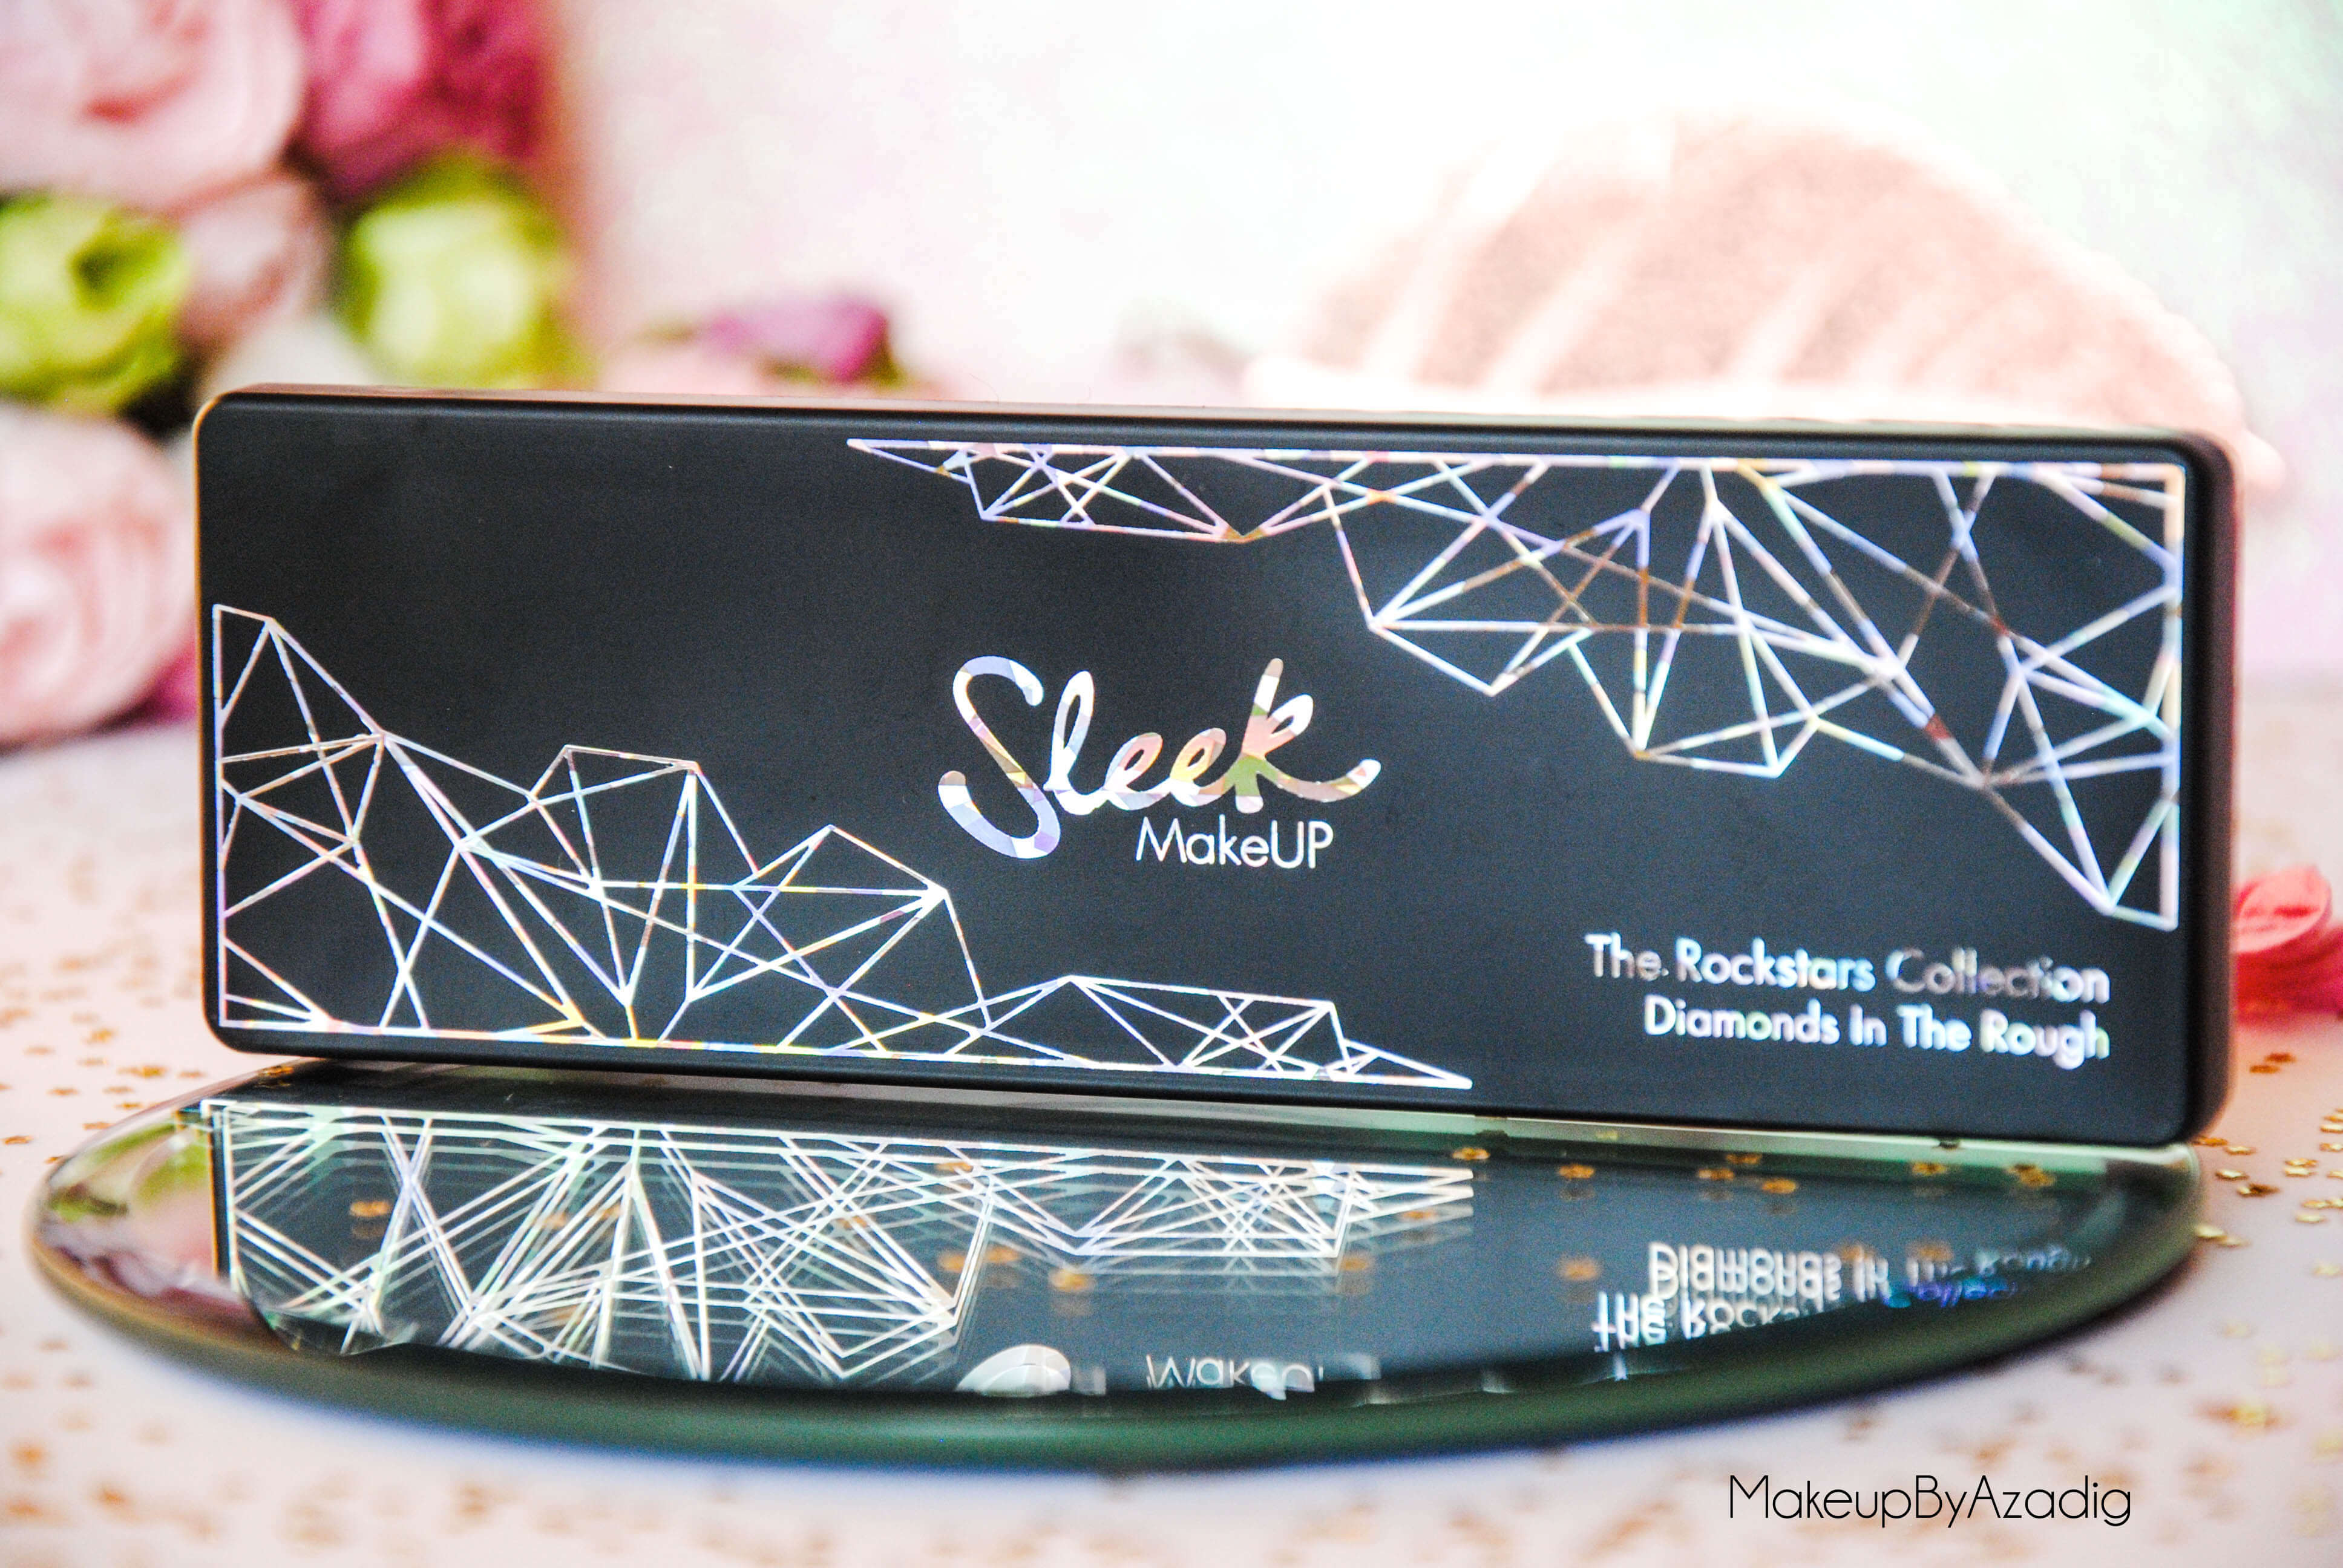 palette-eyeshadow-sleek-makeup-diamonds-in-the-rough-ilust-sephora-paris-makeupbyazadig-noel-code-promo-avis-prix-collection